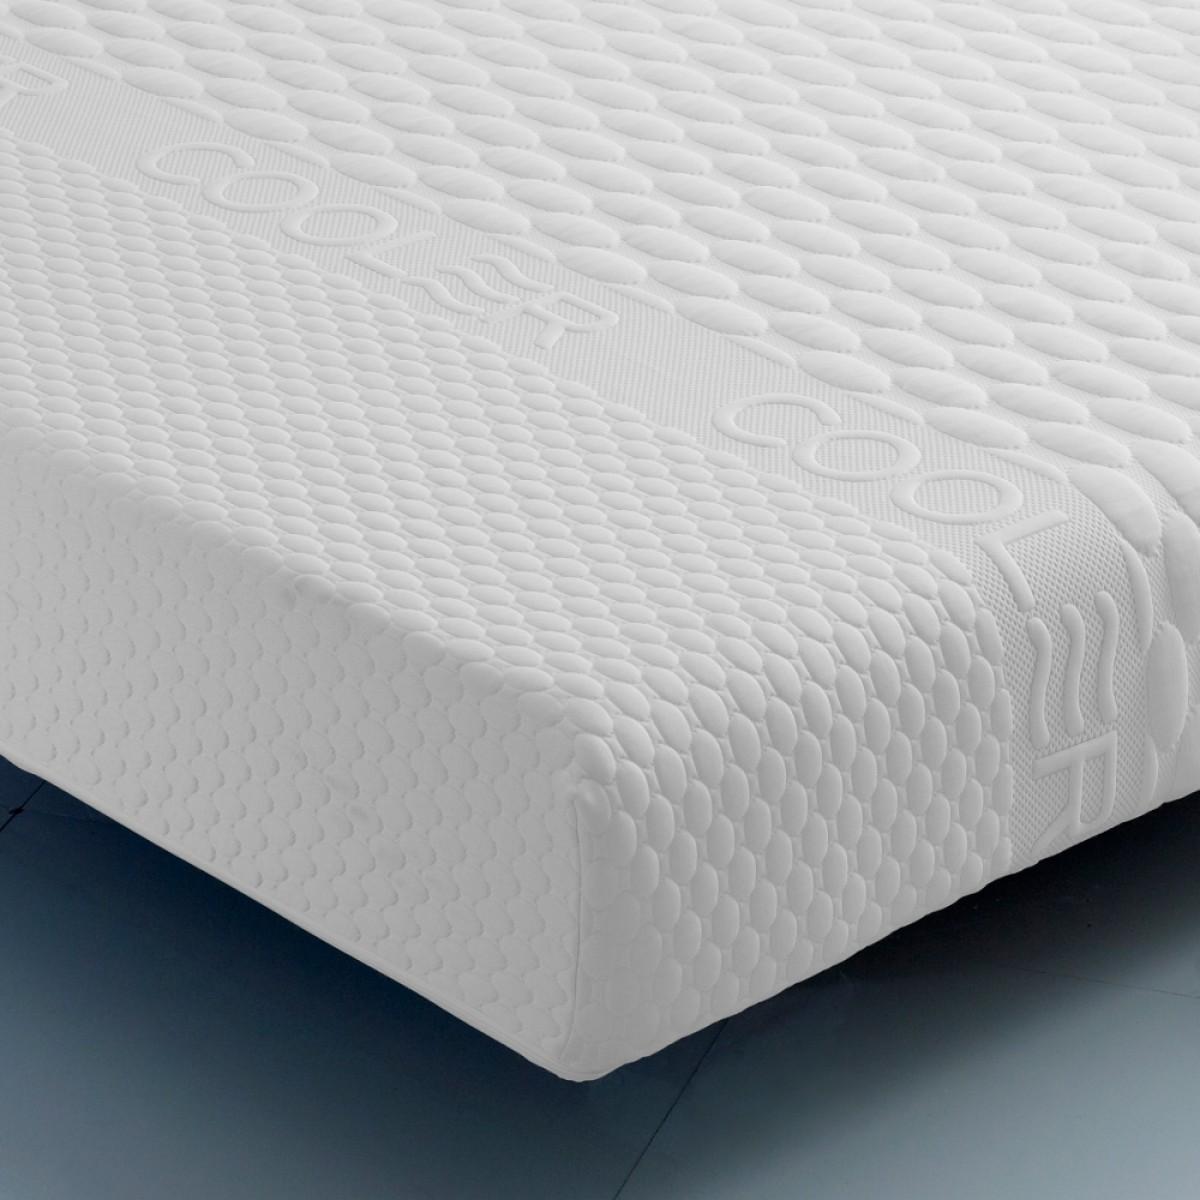 Ocean Gel Memory and Reflex Foam Cool Orthopaedic LayGel Mattress